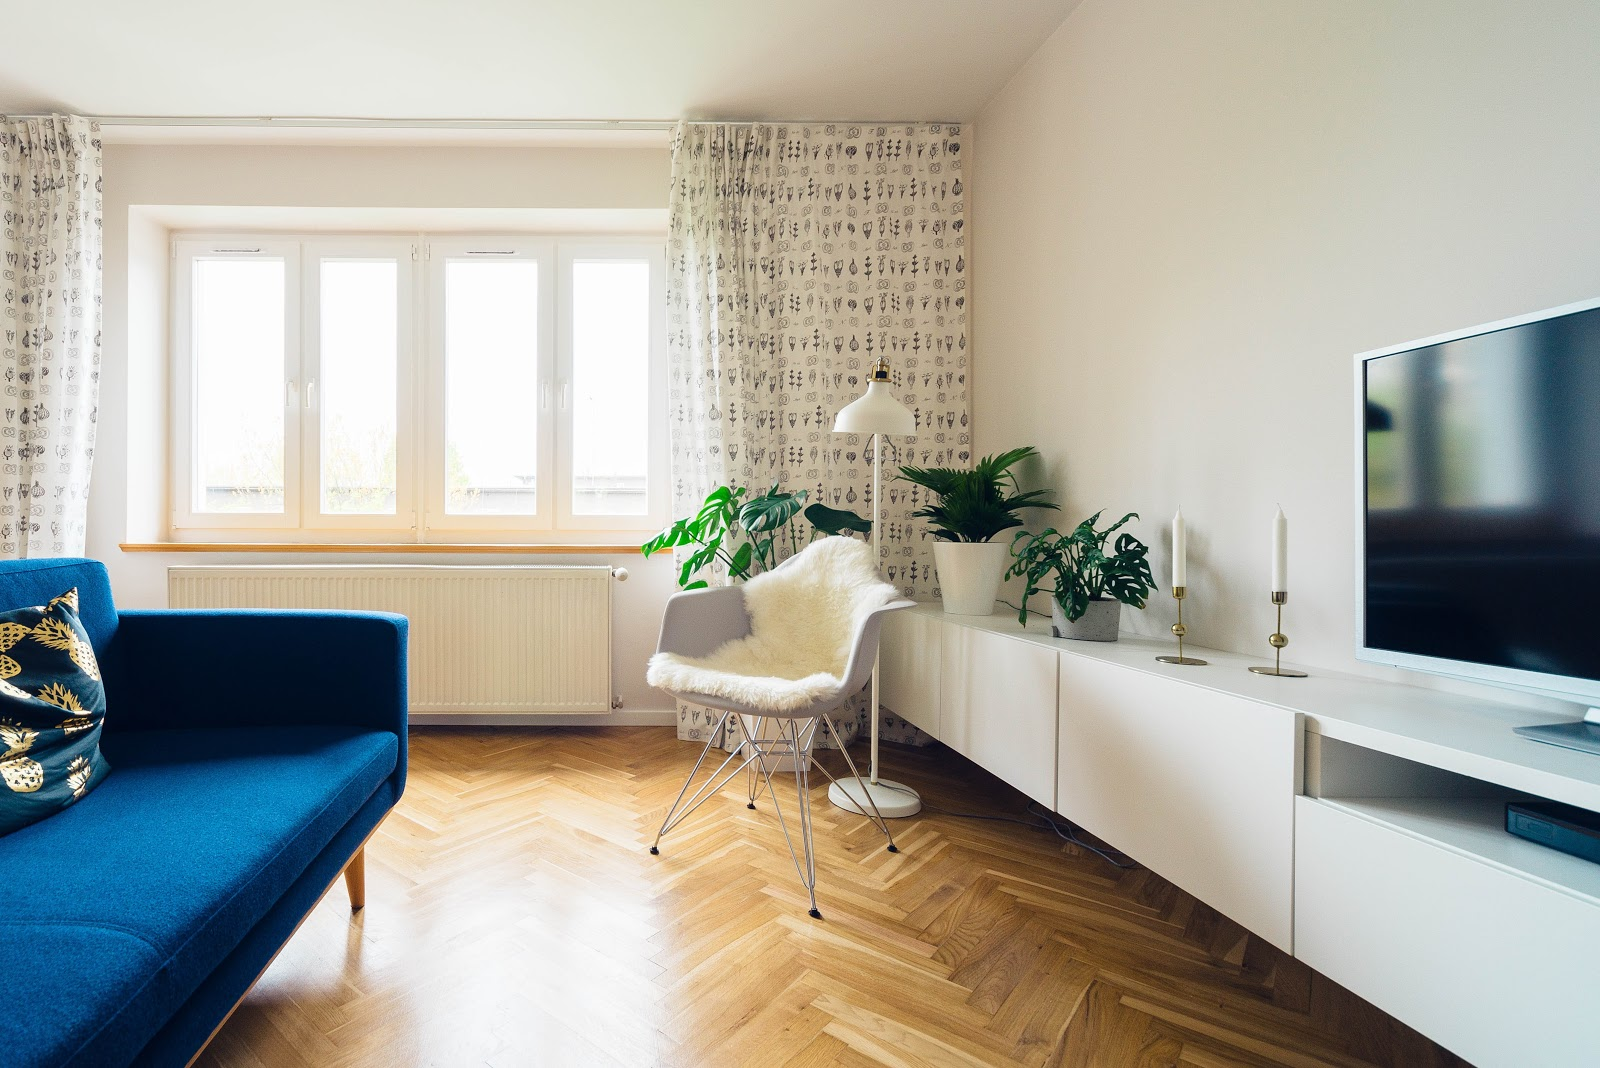 Desain interior scandinavian -  source: unsplash.com